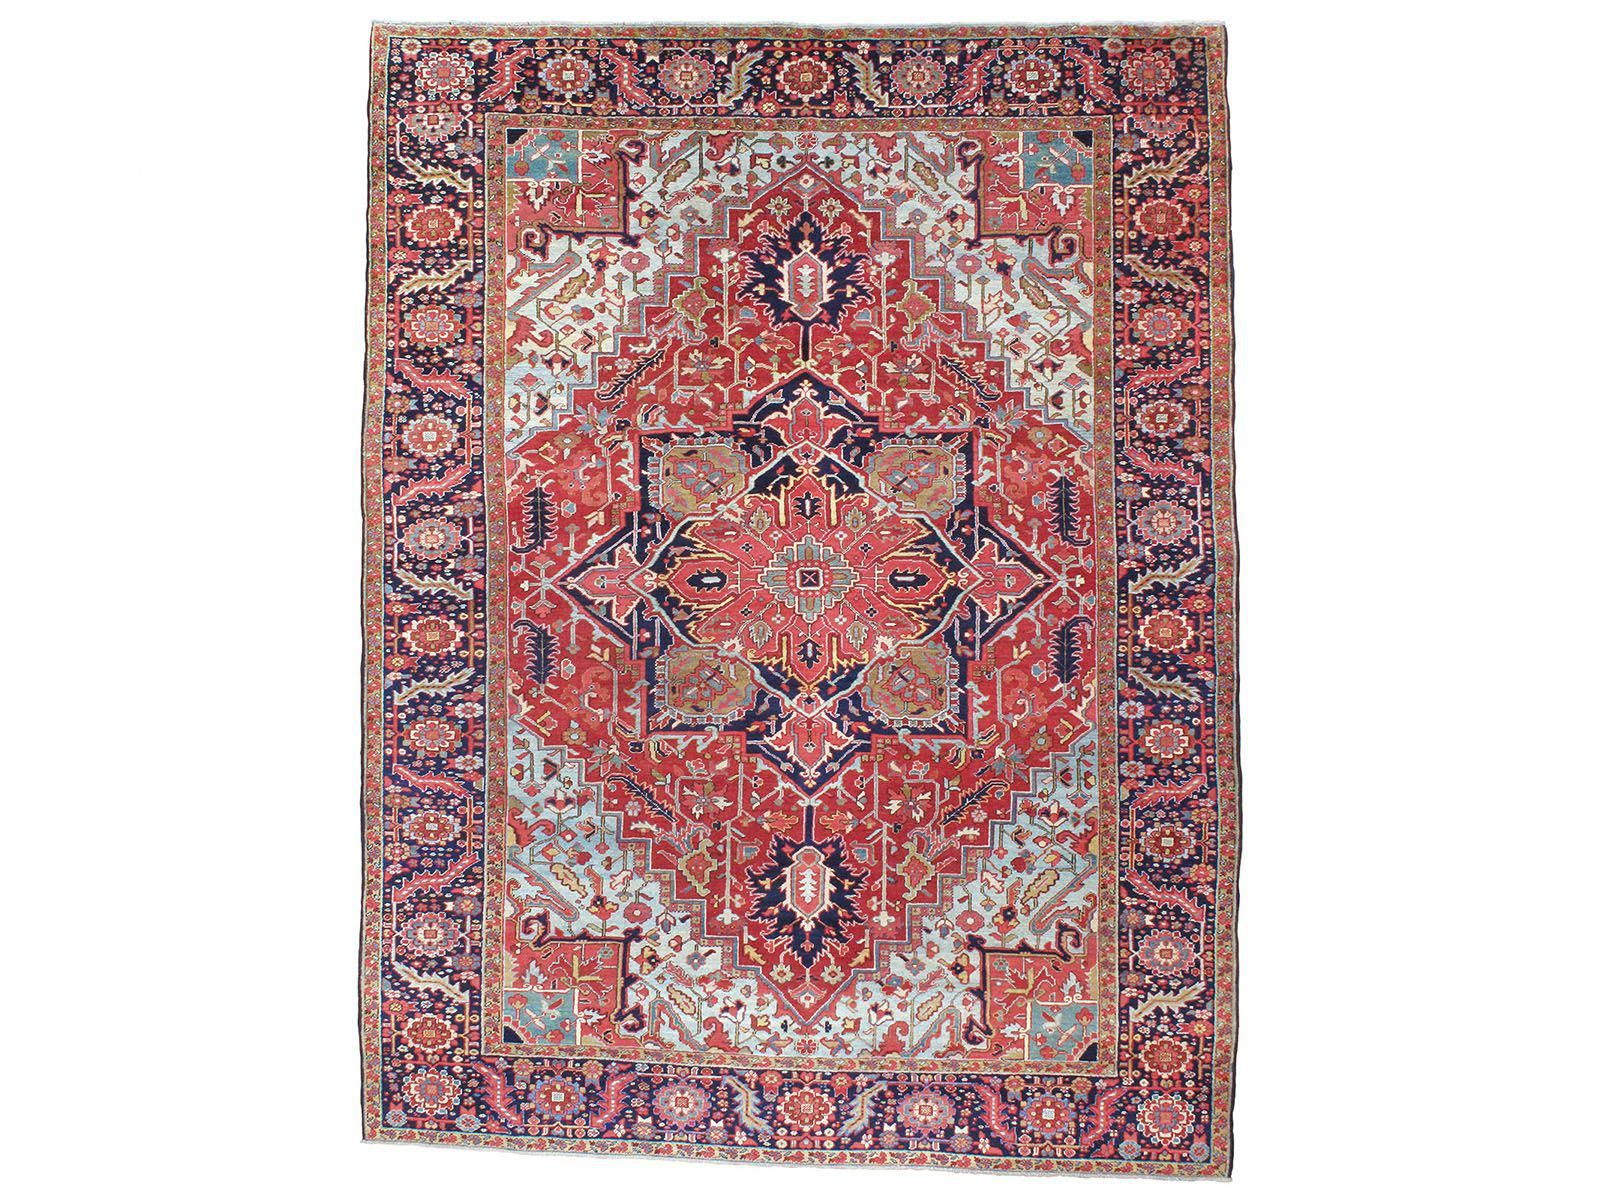 Carpet Runners By The Foot Lowes Carpetrunnershomedepot Carpet   Lowes Carpet Runners By The Foot   Persian Carpet   Beige Carpet   Heriz Rug   Kilim Rugs   Stairs